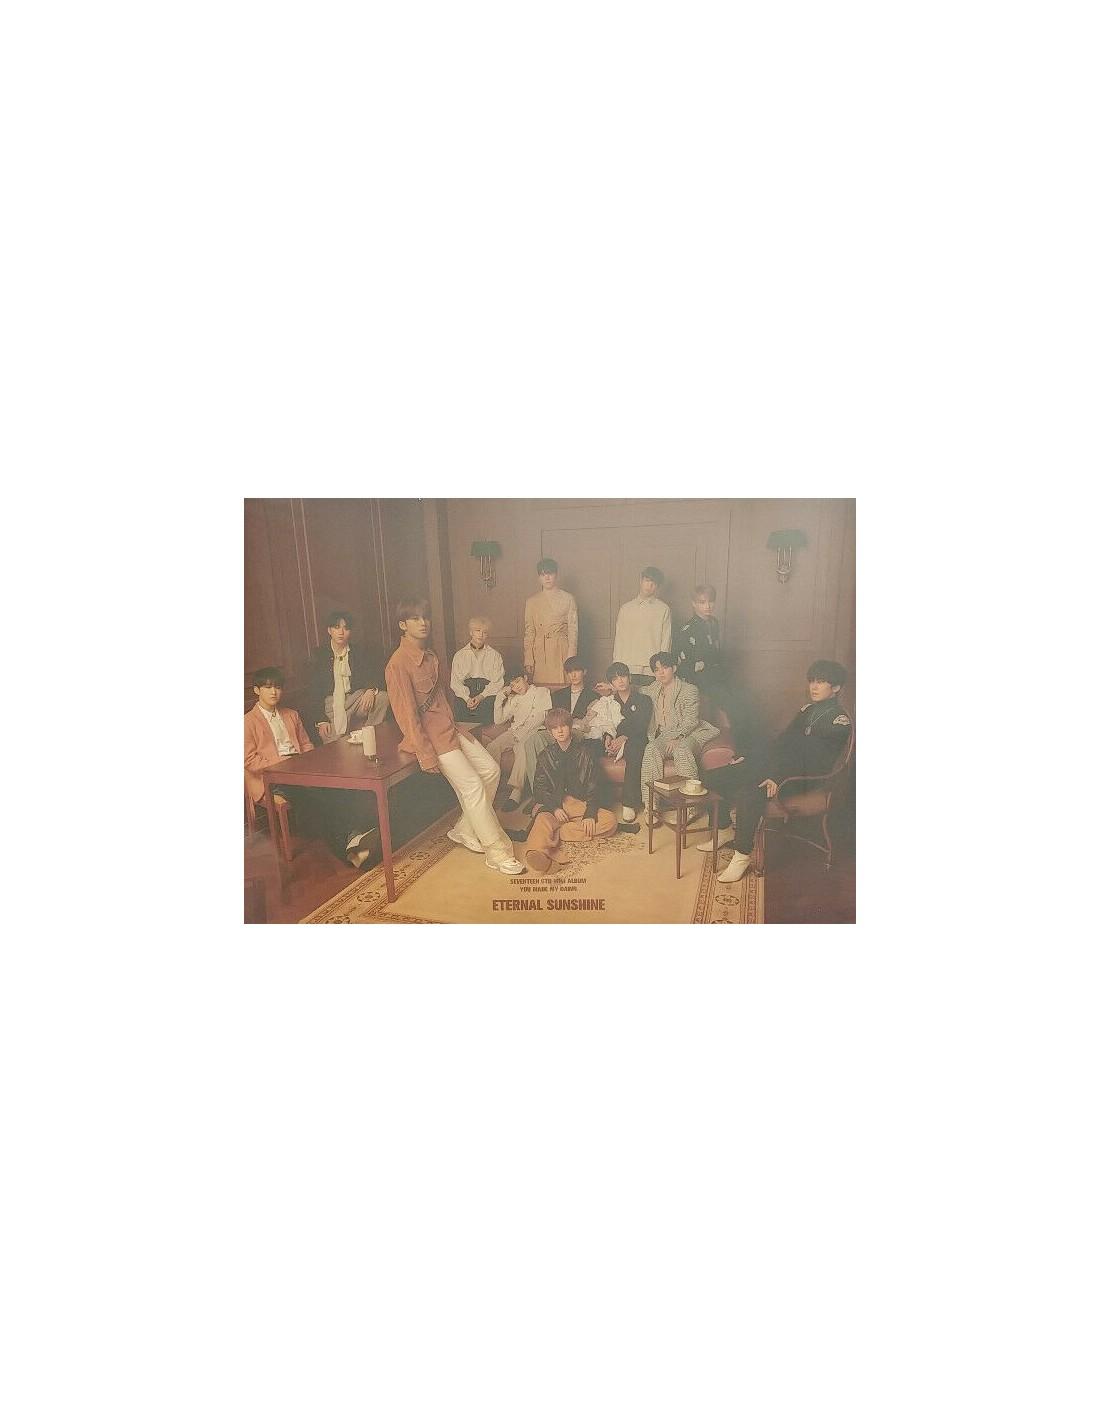 [Poster] SEVENTEEN 6th Mini Album - YOU MADE MY DAWN (ETERNAL SUNSHINE VER)